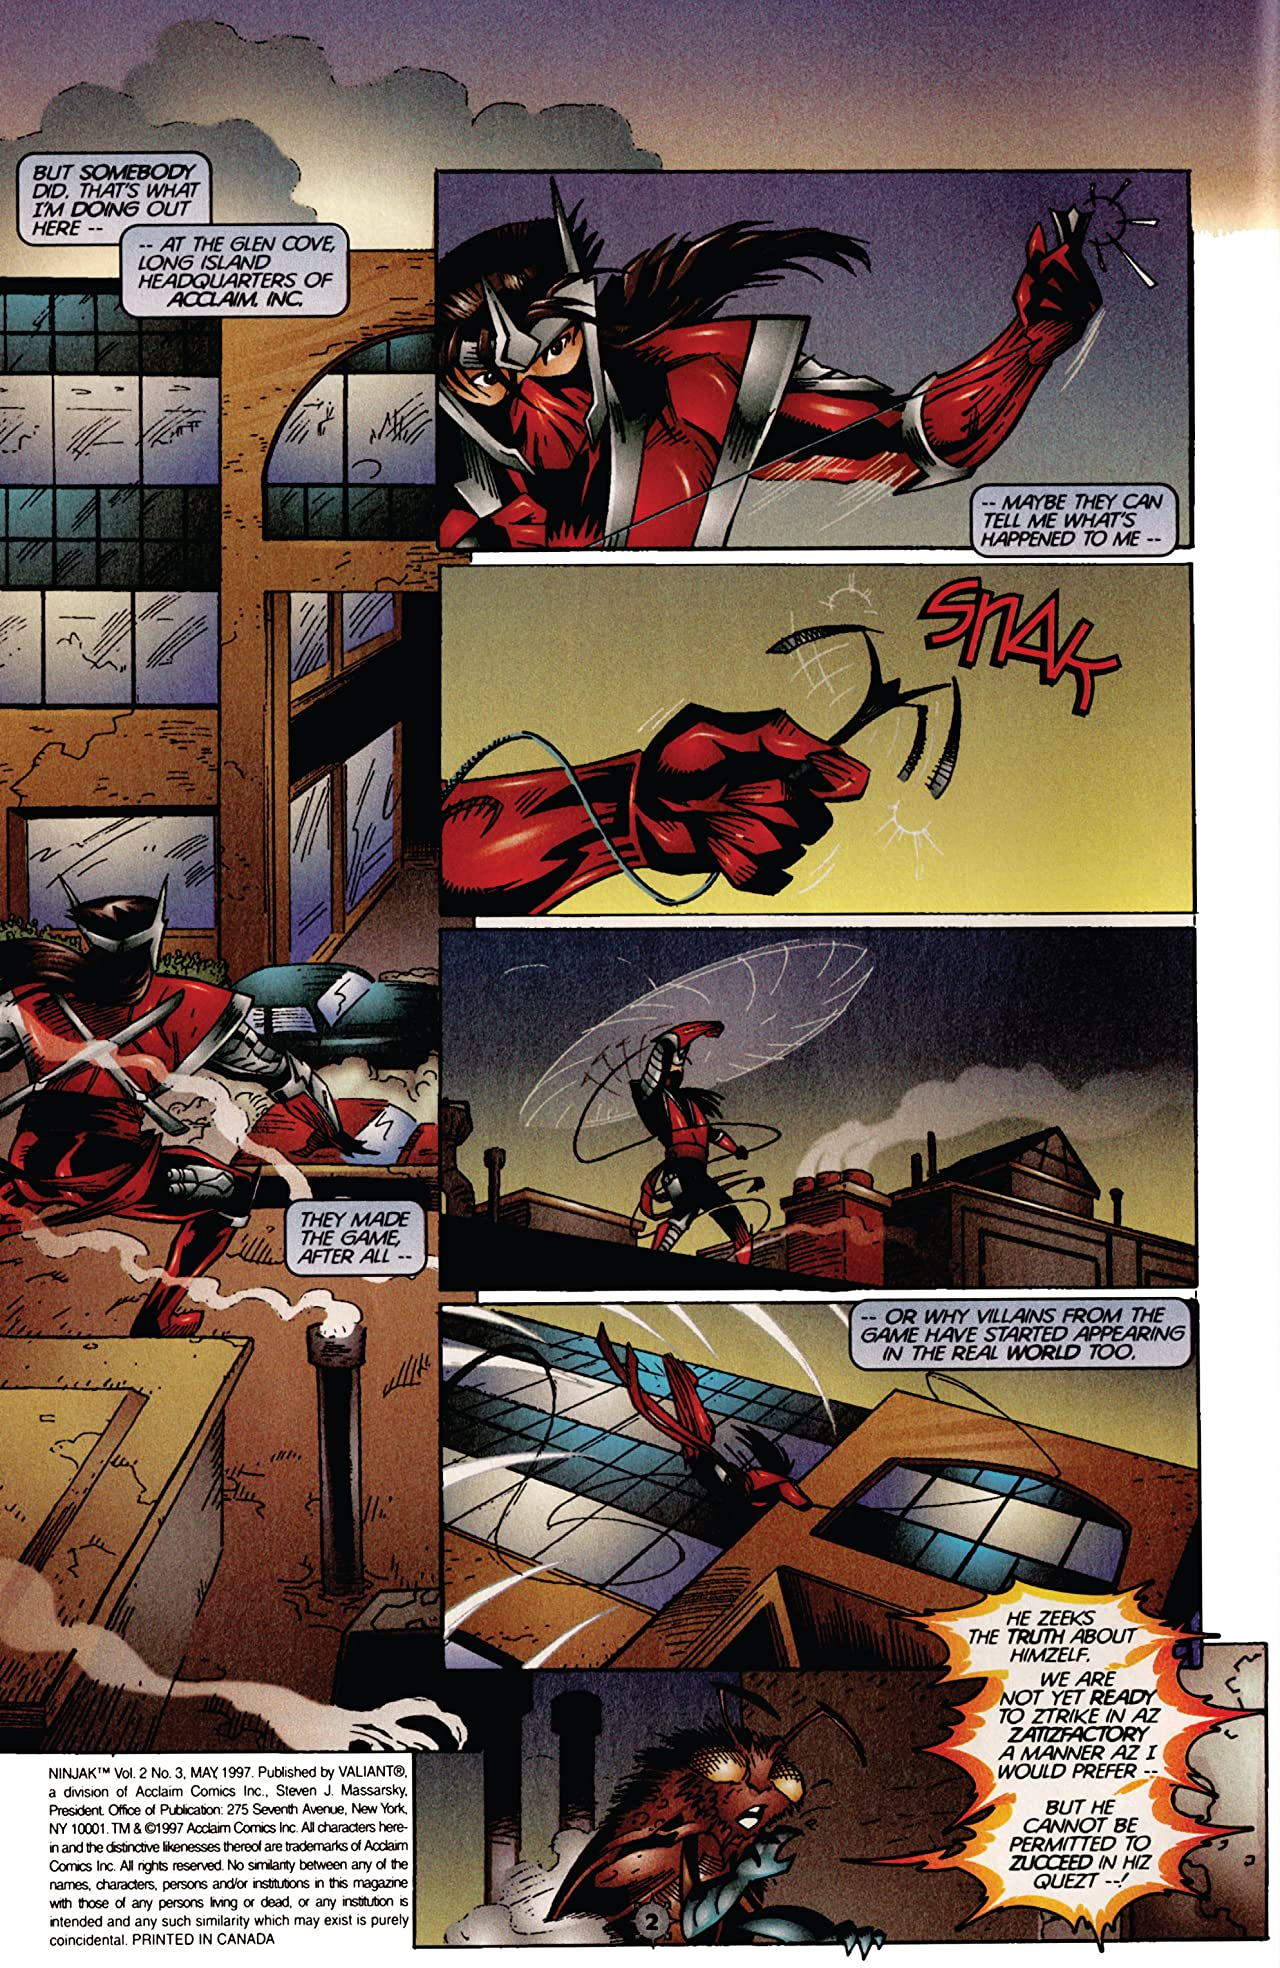 Ninjak (1997) #3